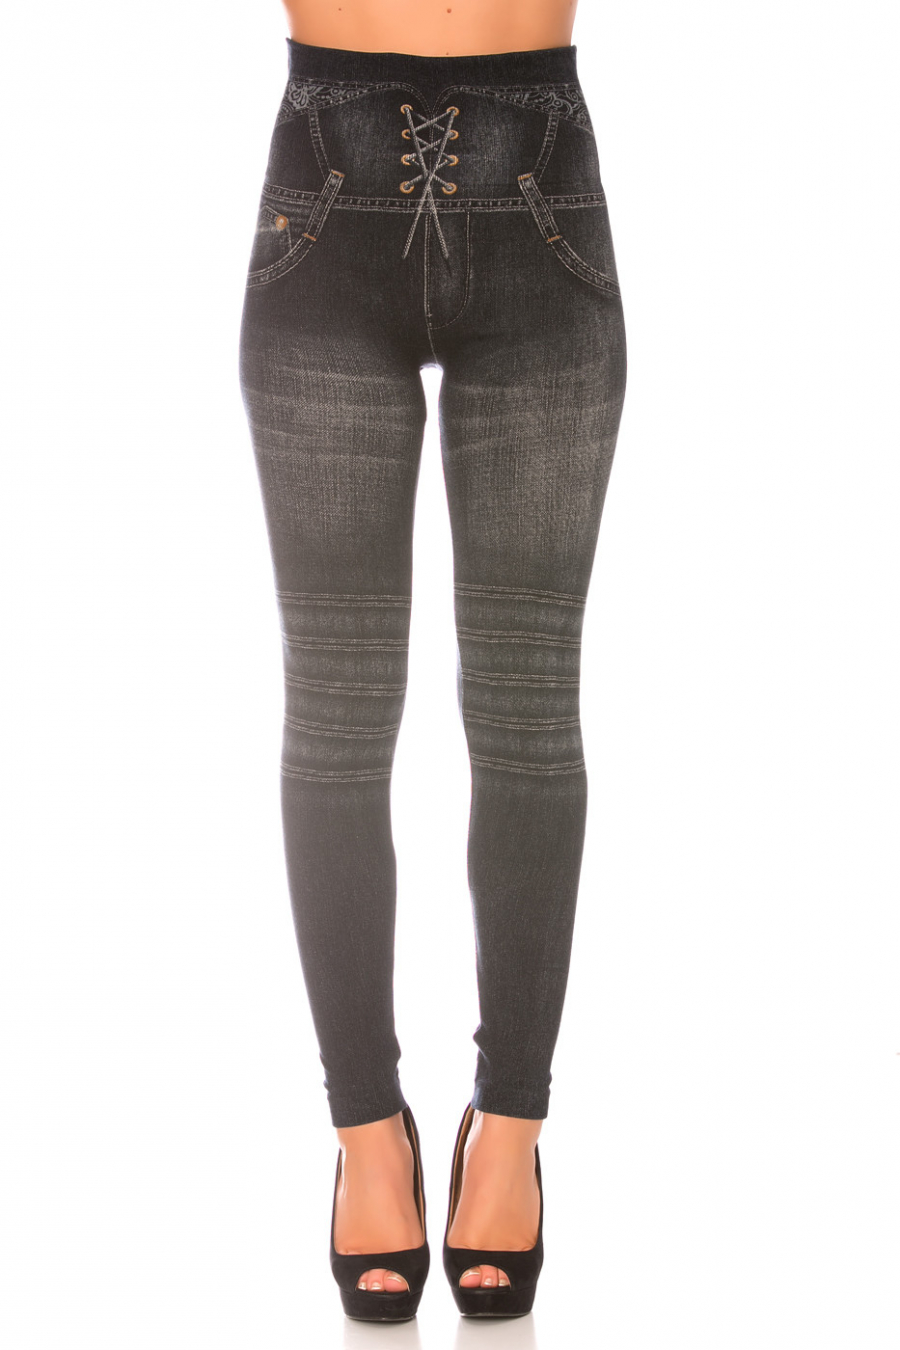 Zwarte slankmakende legging in jeansstijl met hoge taille en gekruiste schakels. Opdrukeffect